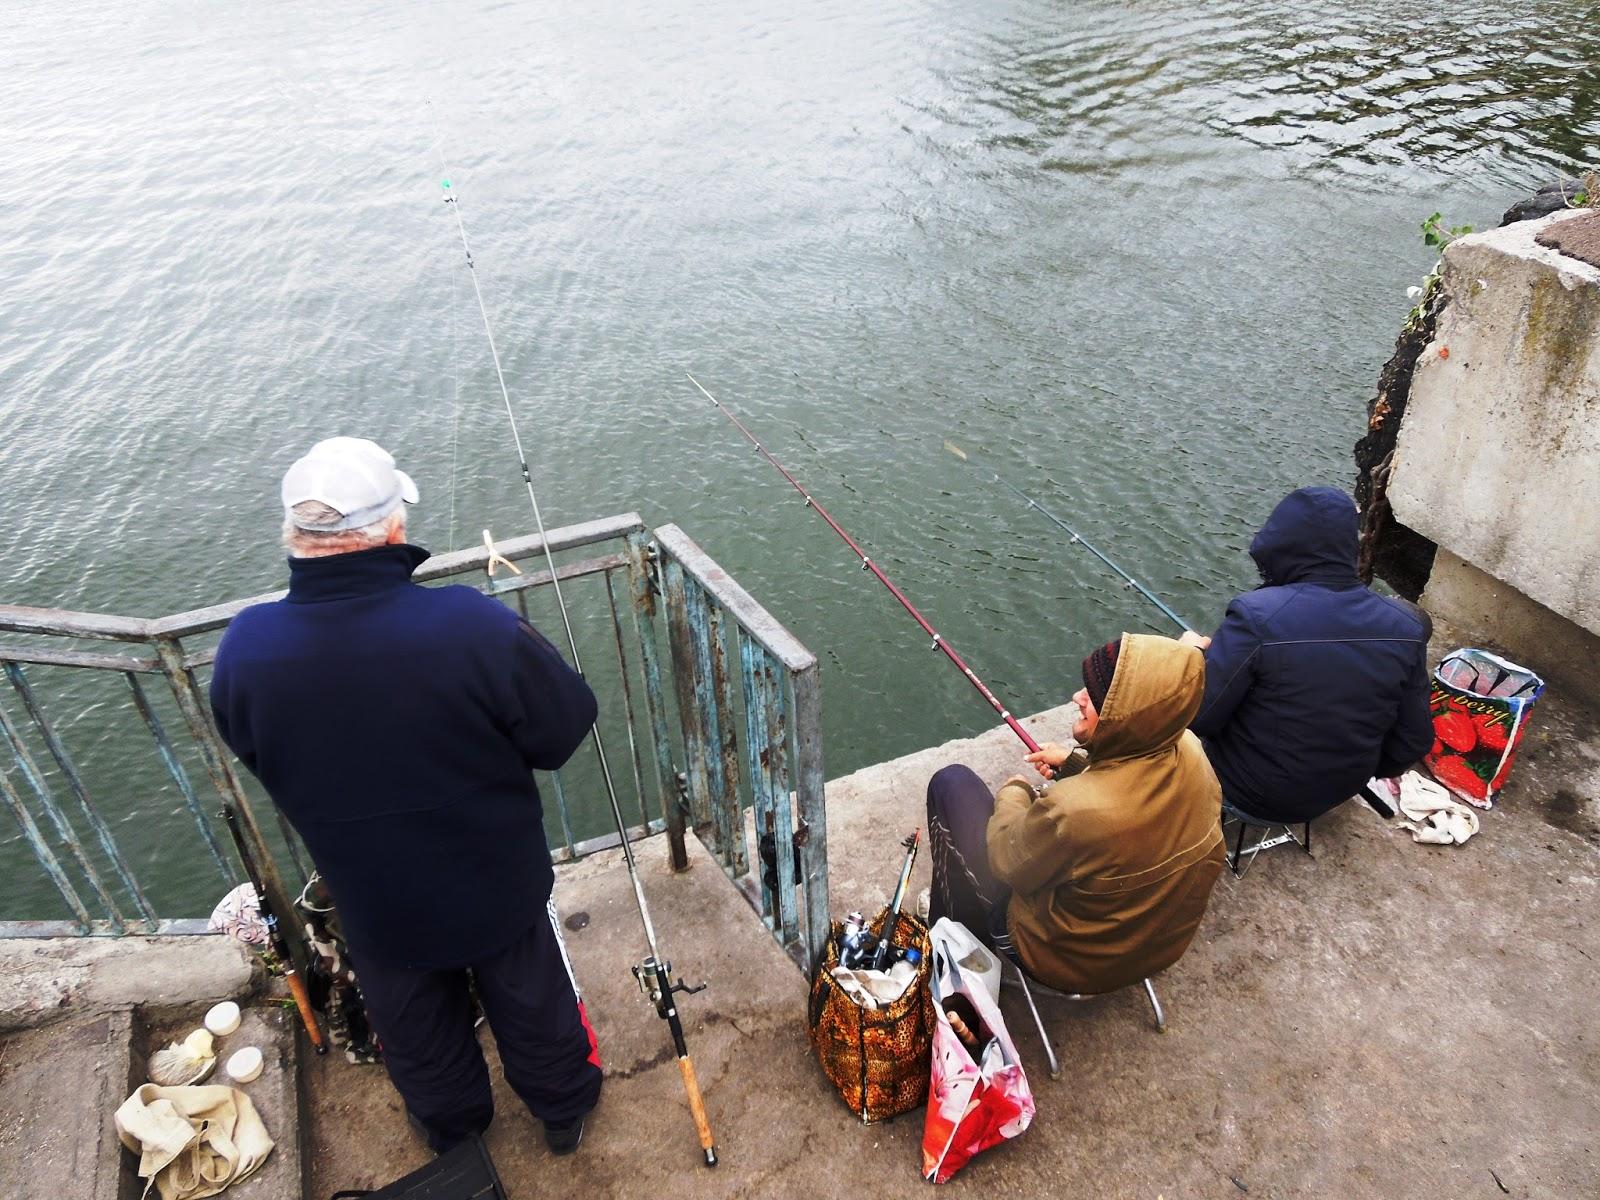 черкассы рыбалка на пирс